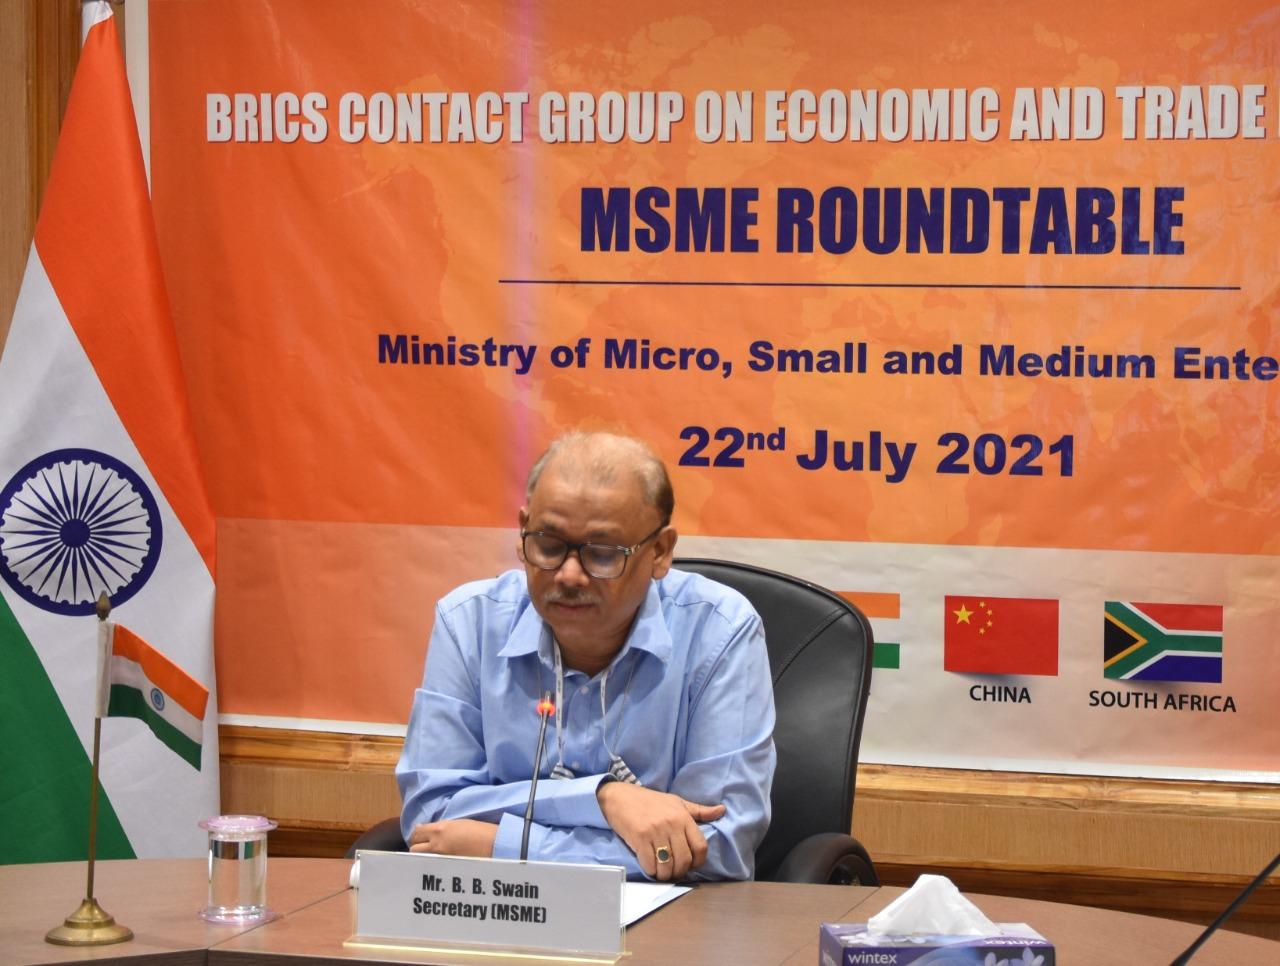 BB Swain, BRICS MSME, MSME Ministry